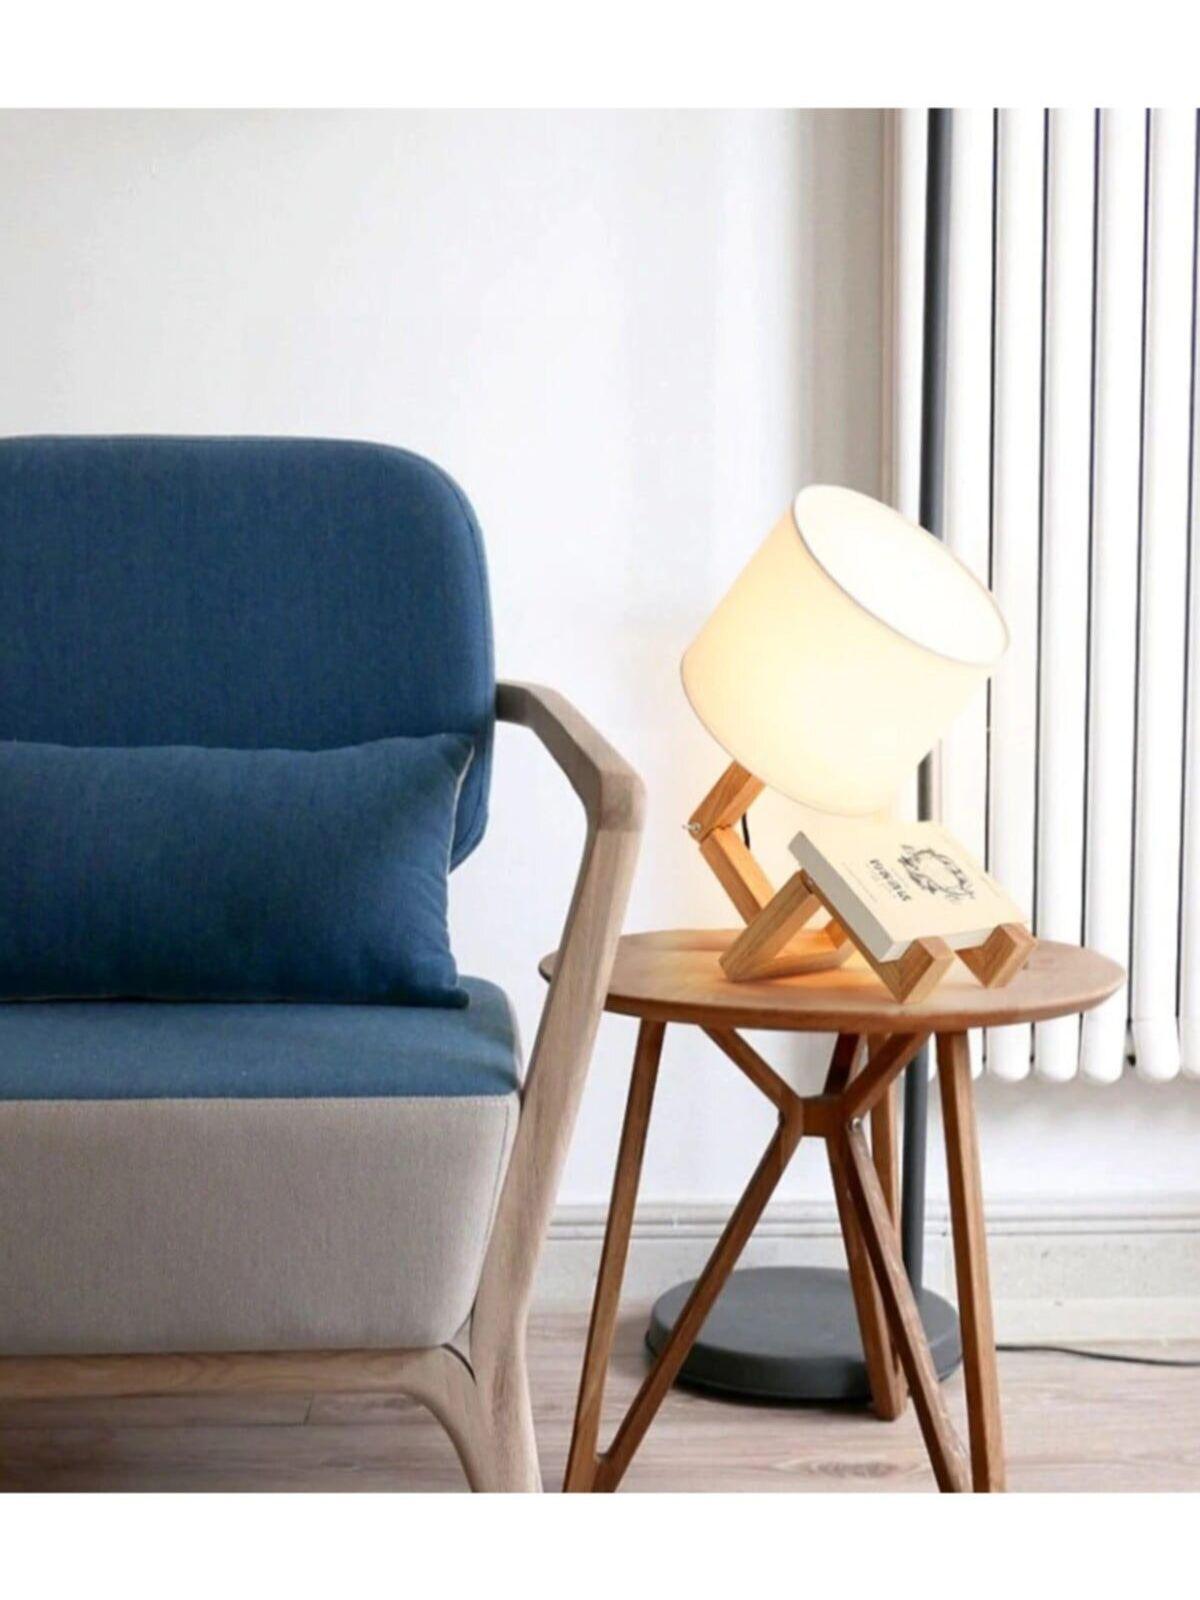 Wood Man Table Lamp Squarehead Model Lampshade The Library Night lamp enlarge